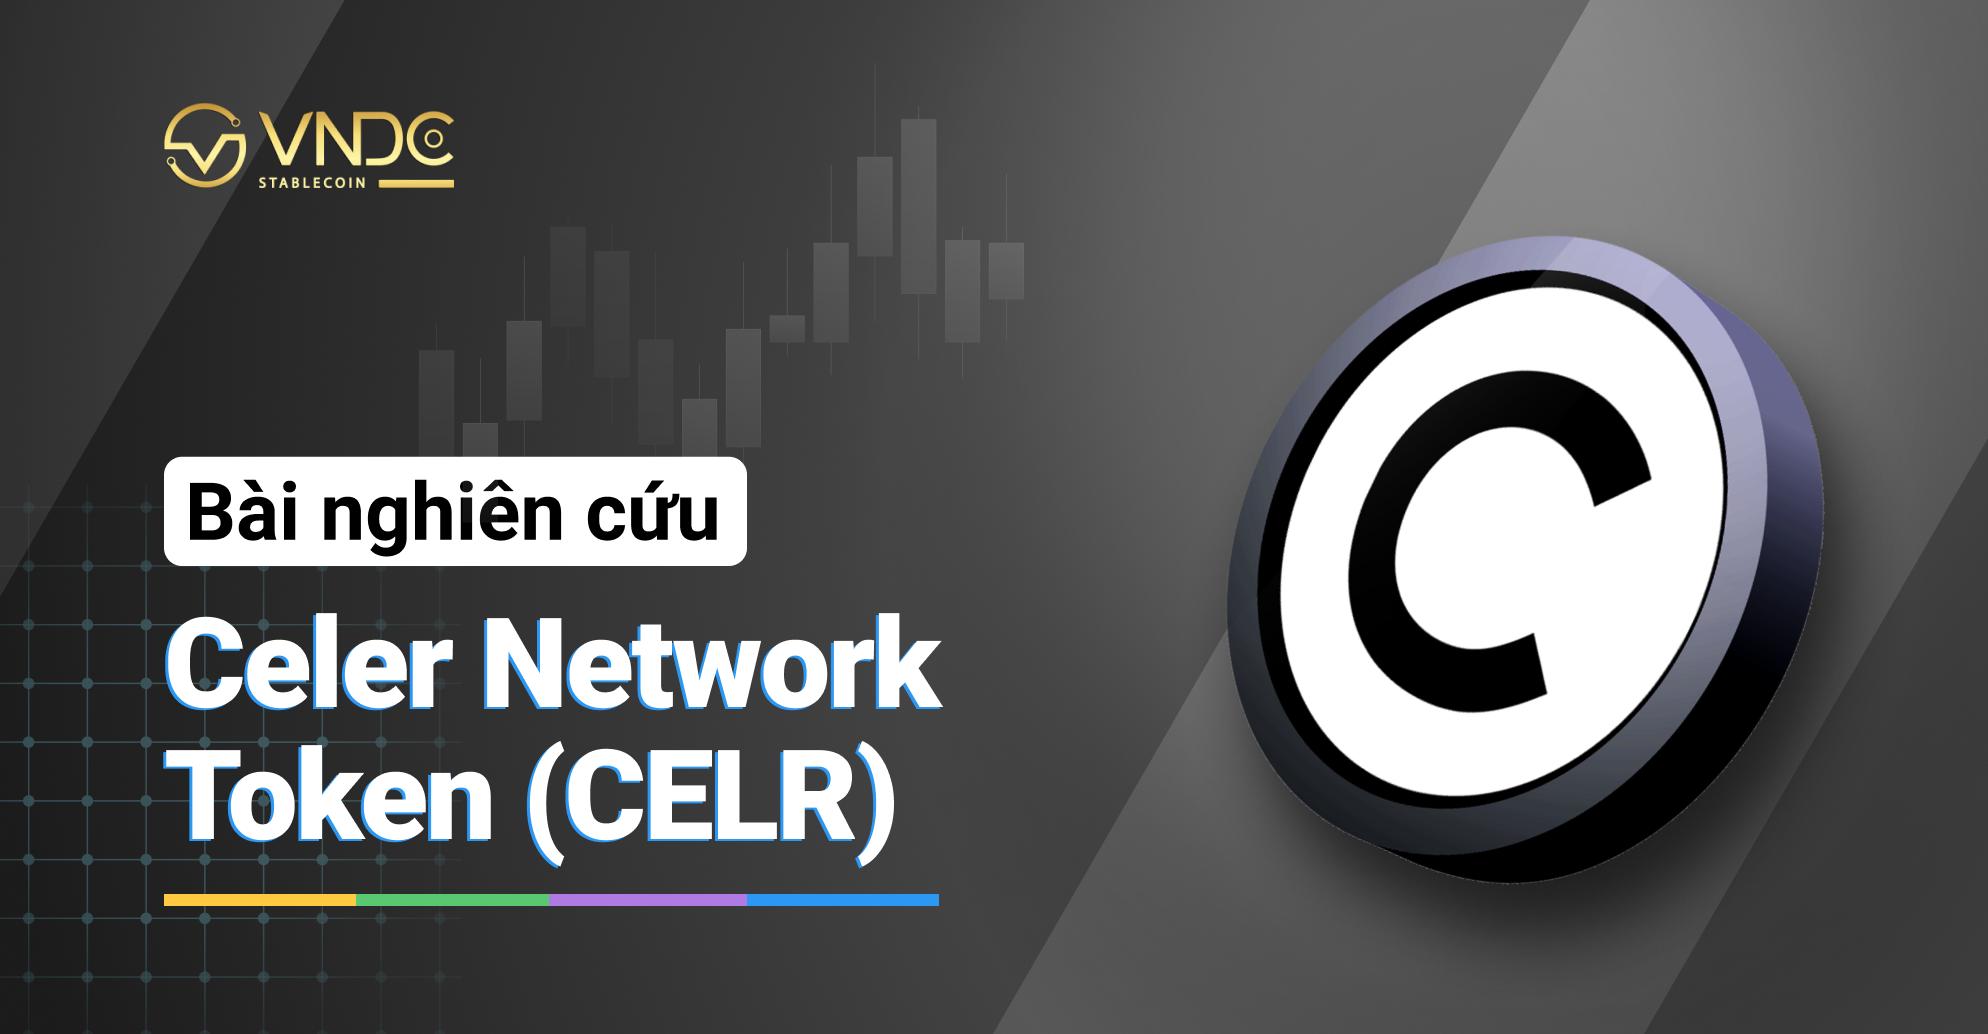 Bài nghiên cứu về Celer Network Token (CELR)